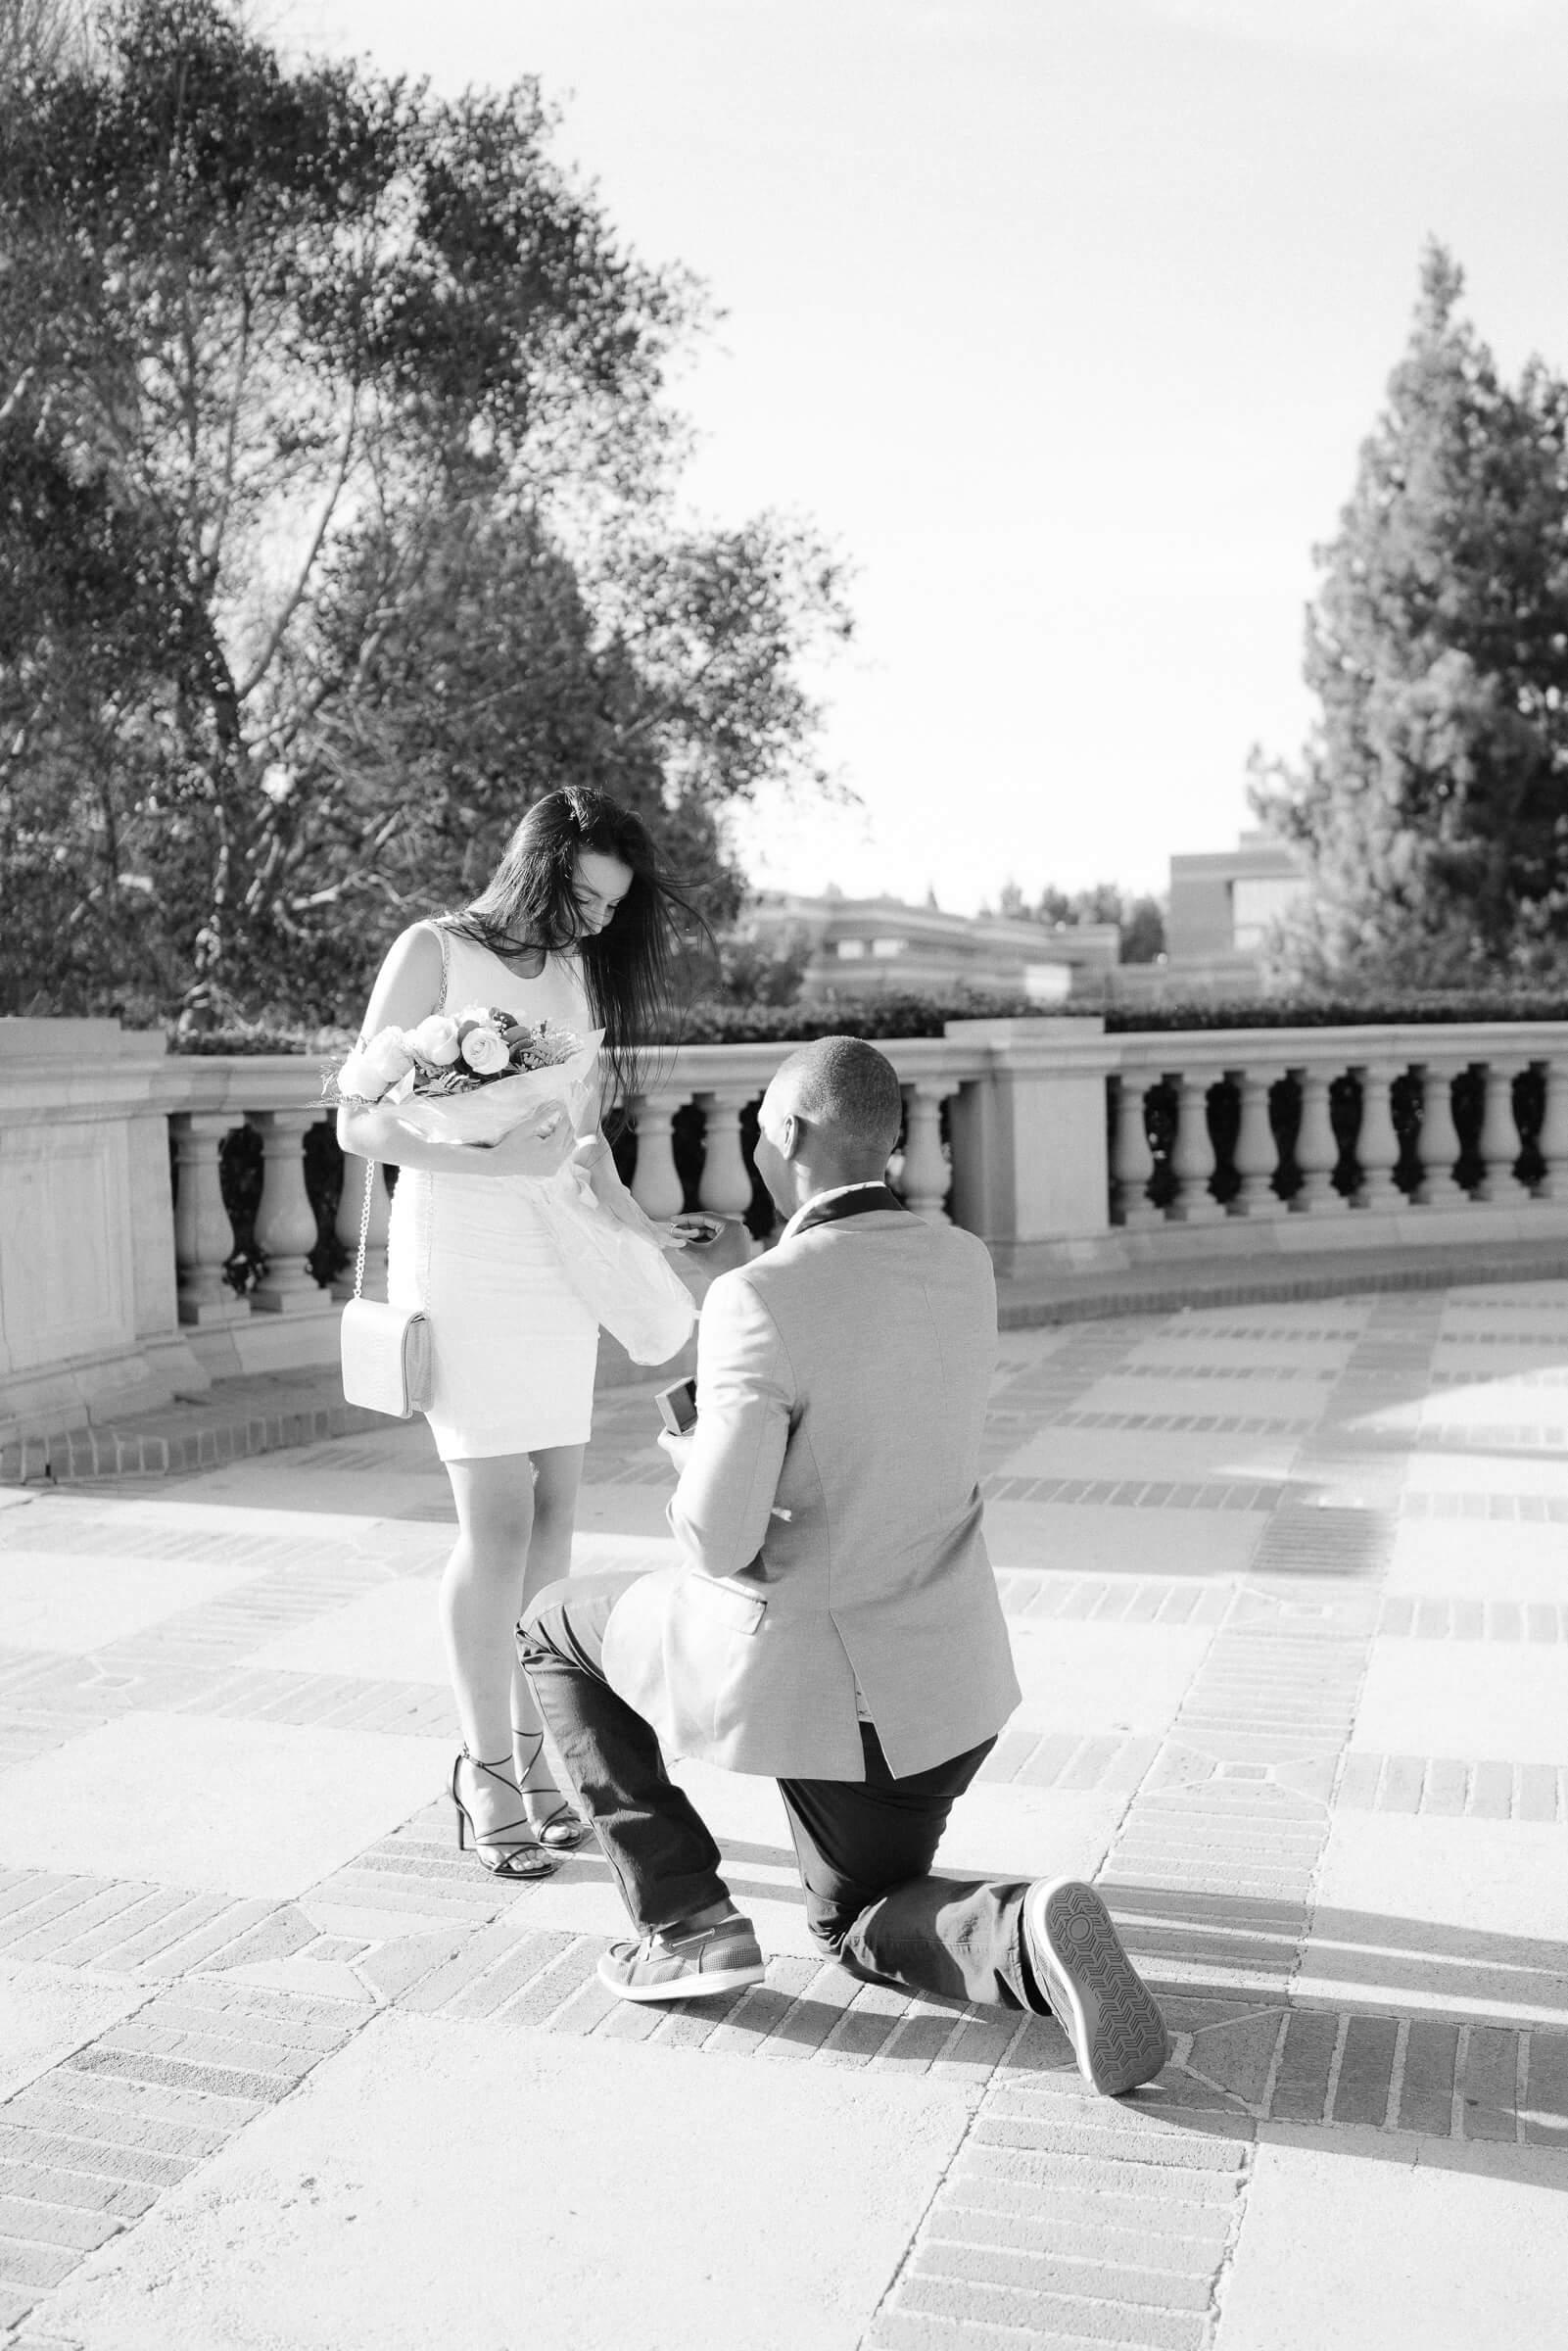 ucla-los-angeles-proposal-photographer-10.jpg